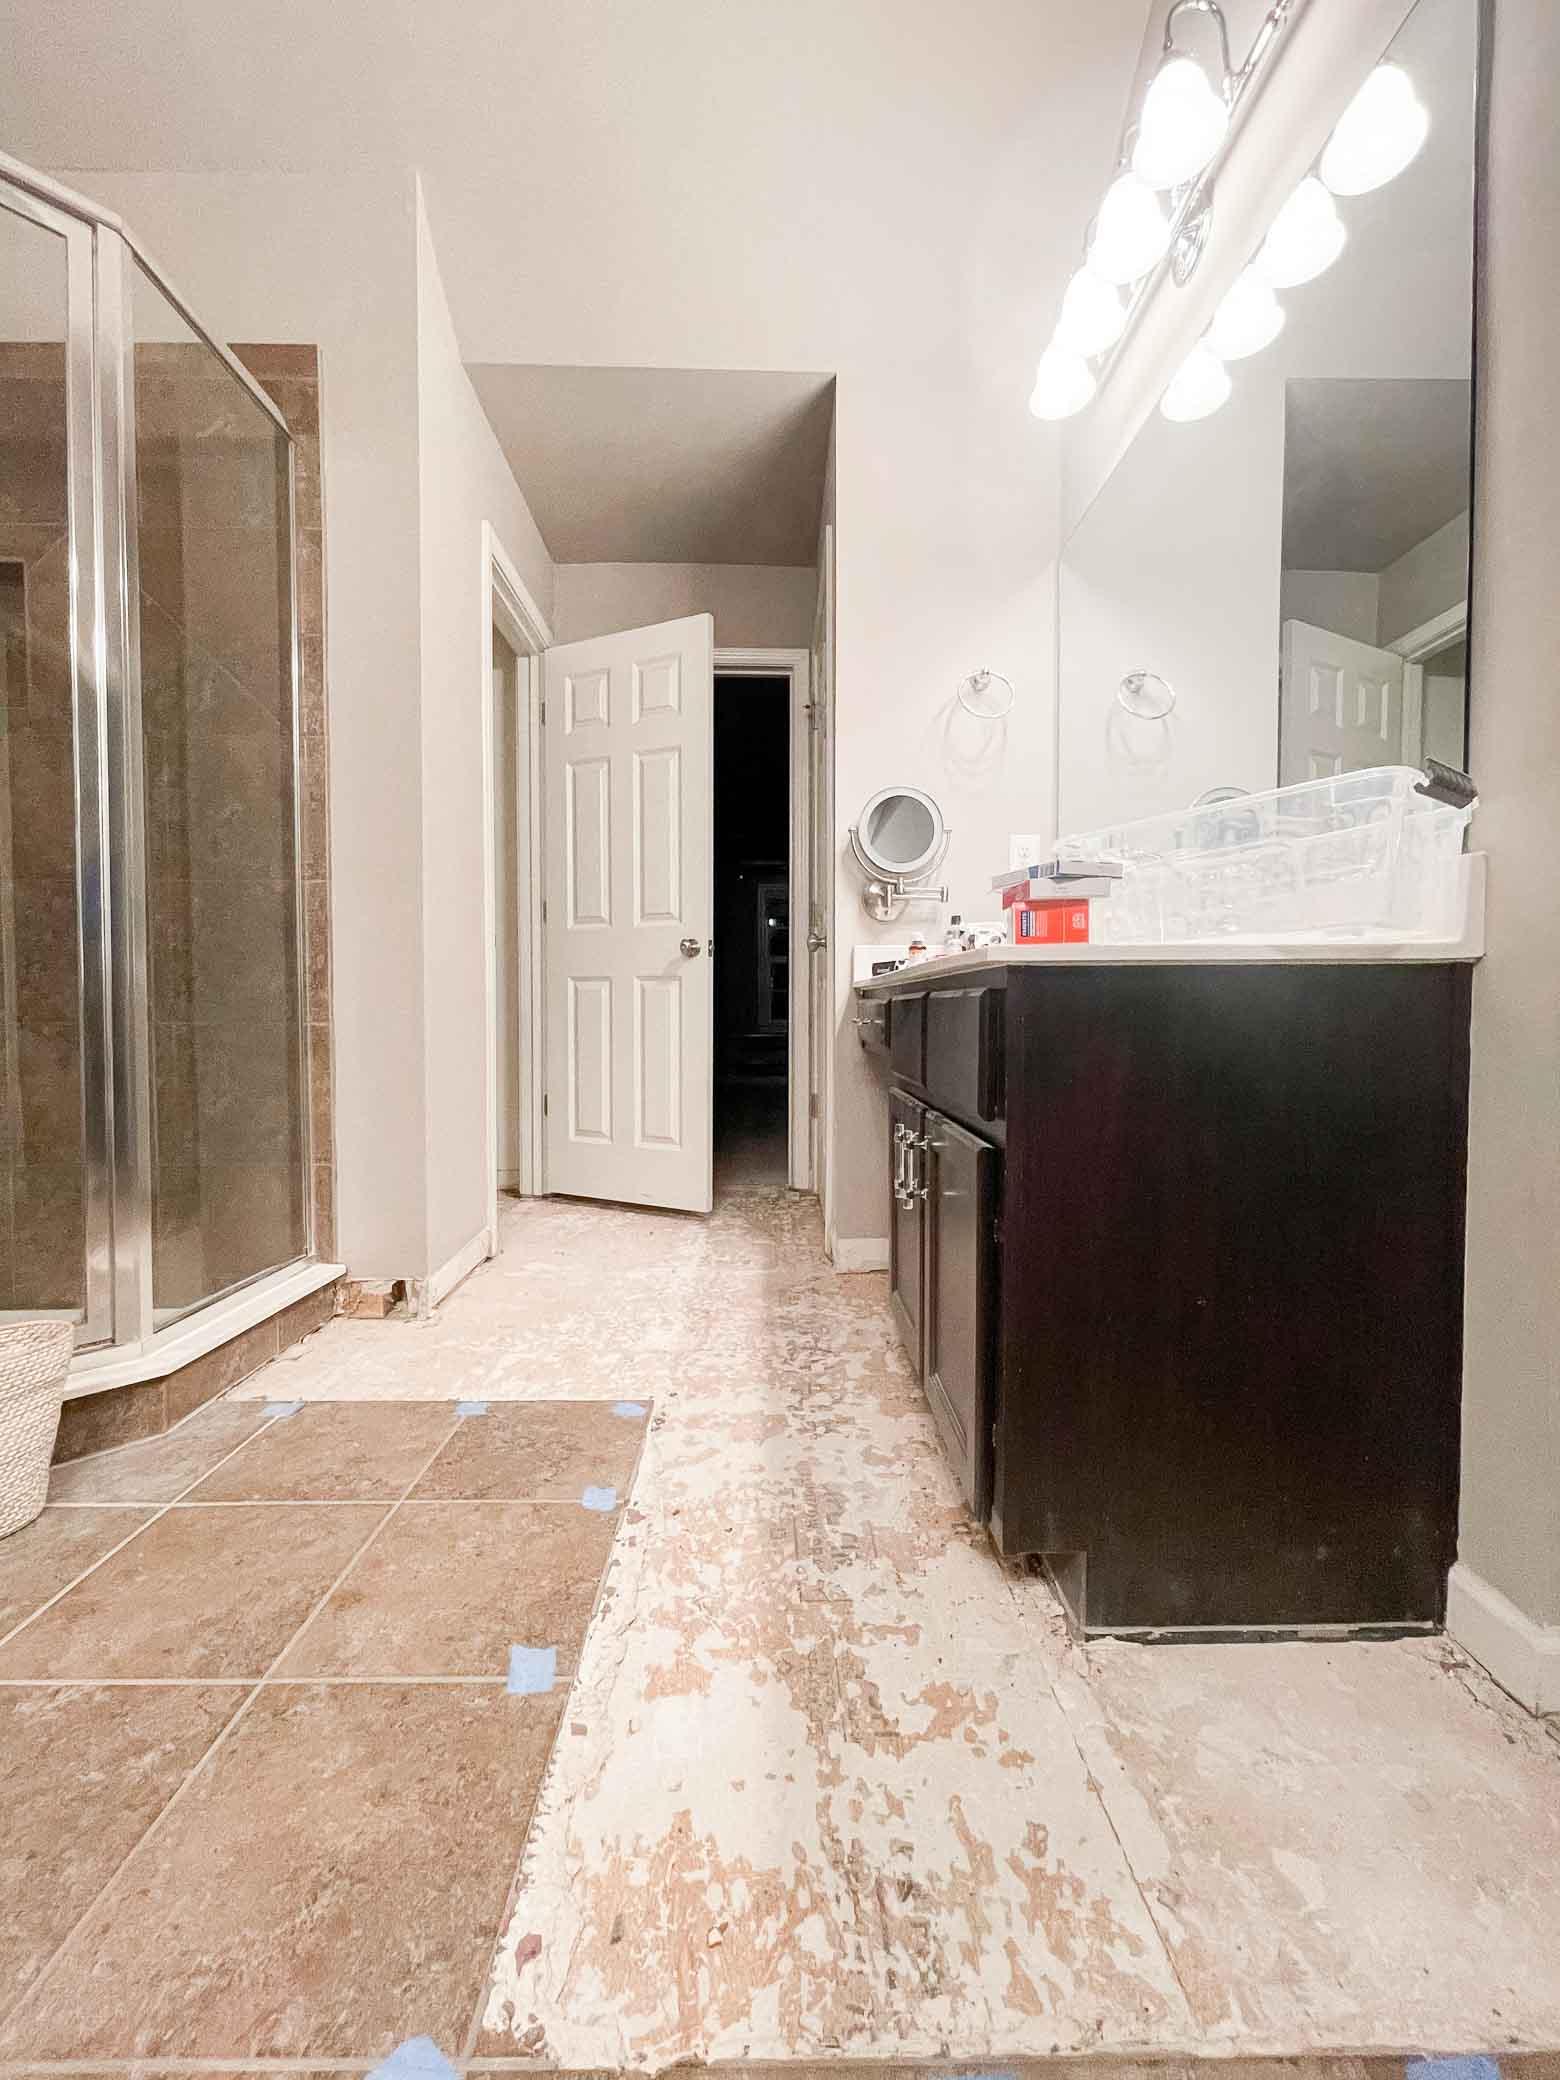 Flooded Bathroom Plans